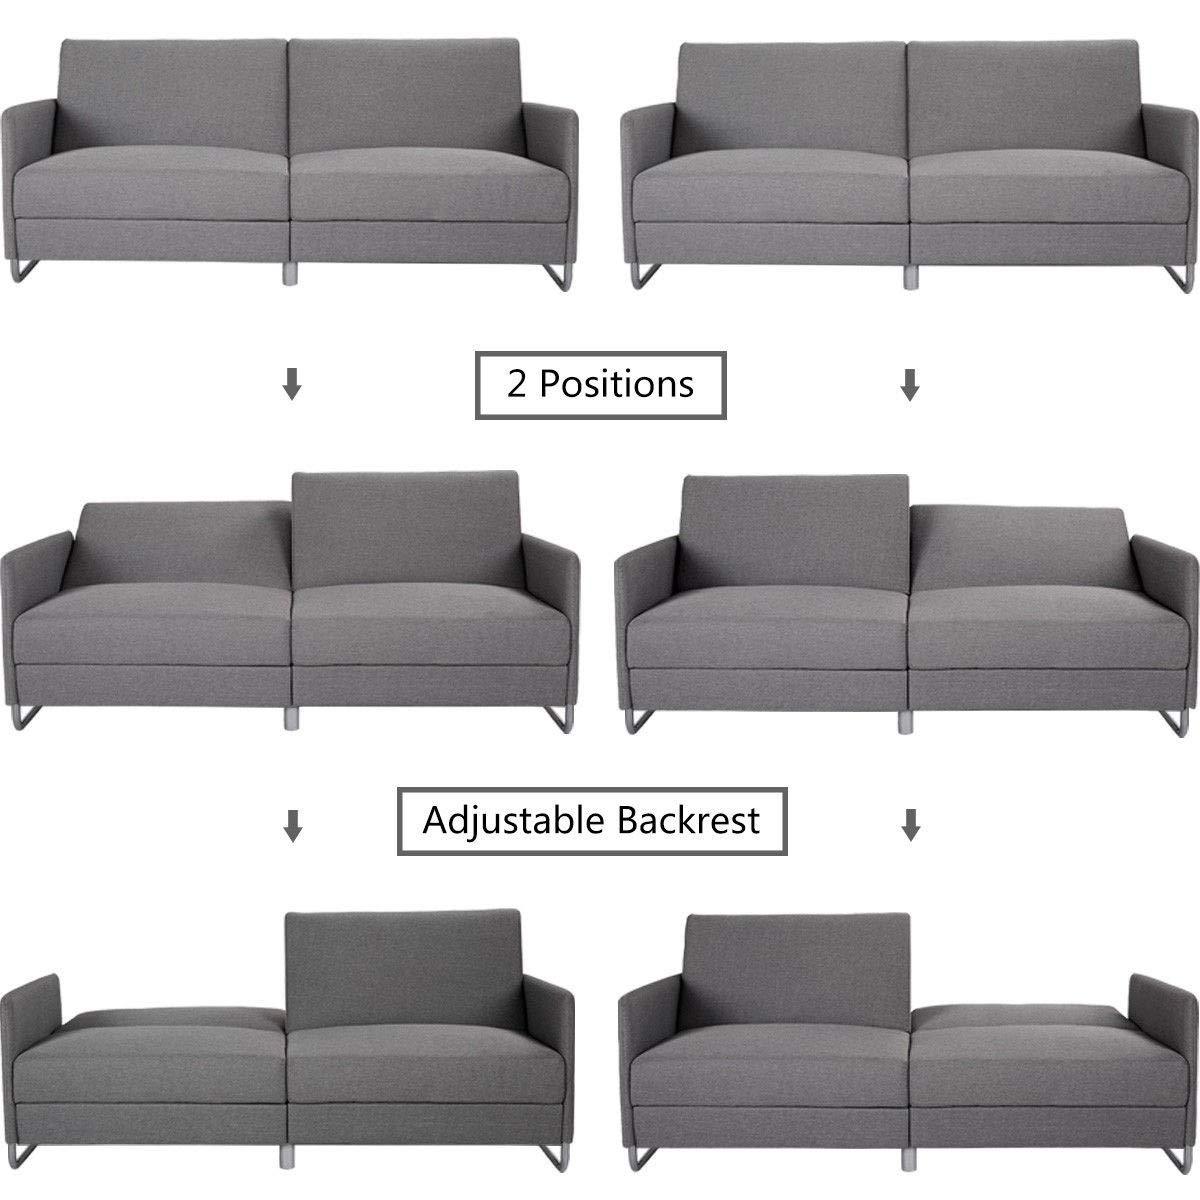 Amazon.com: Modern Futon Convertible Recliner Couch ...